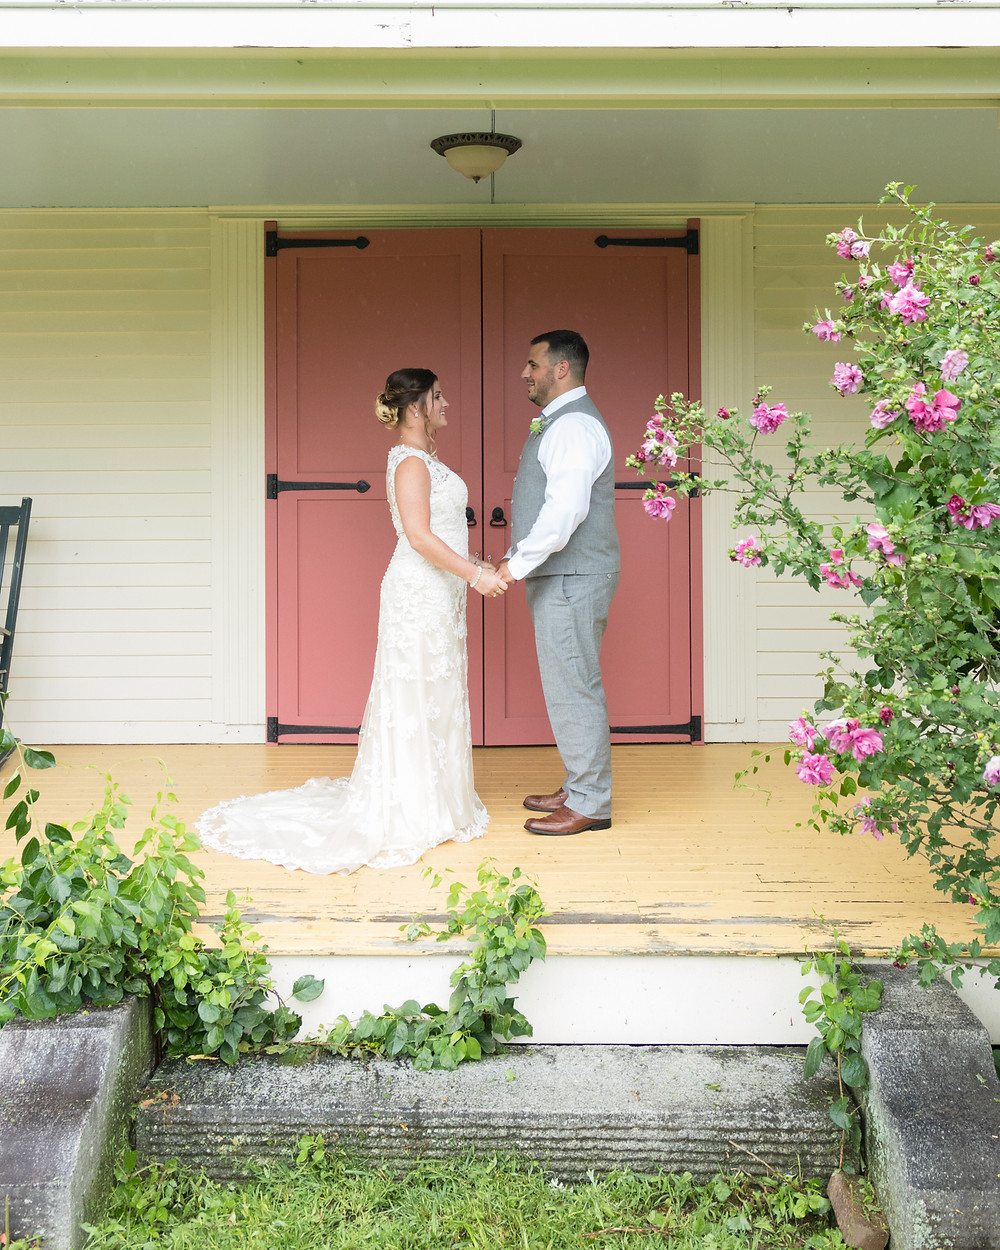 wedding portrait on a porch